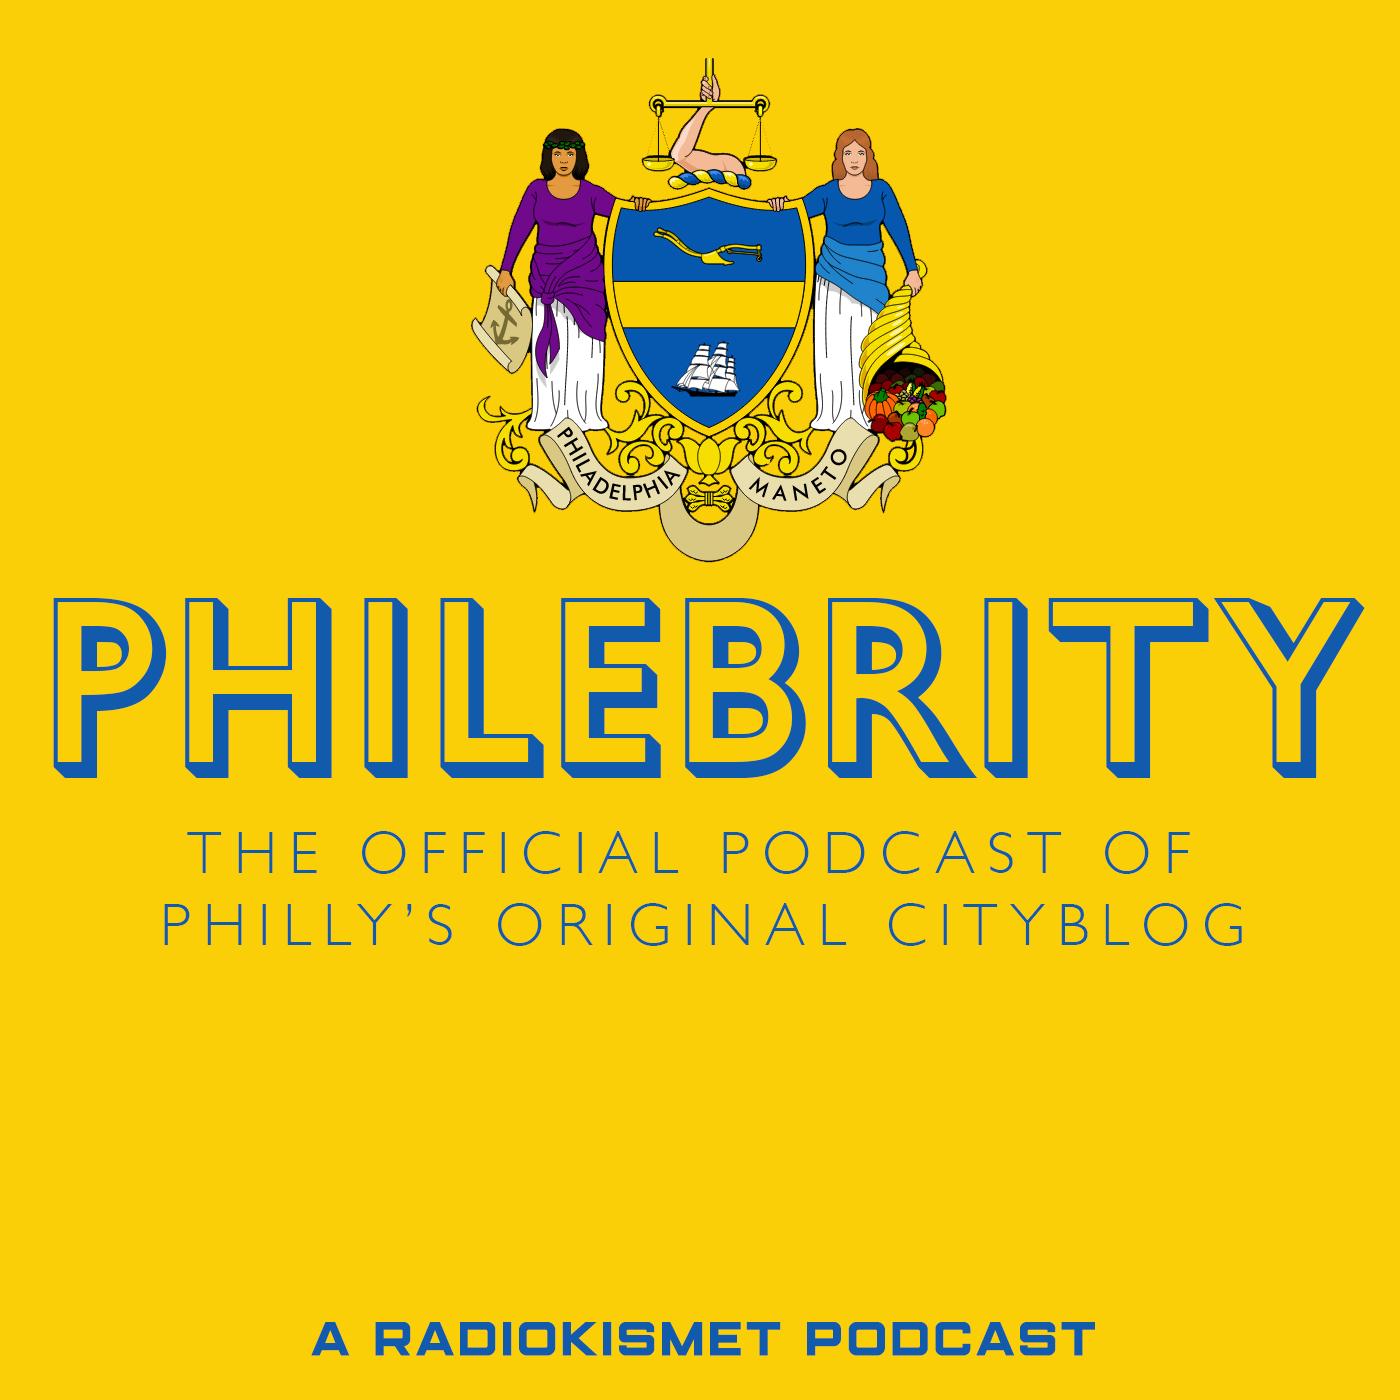 Philebrity show art